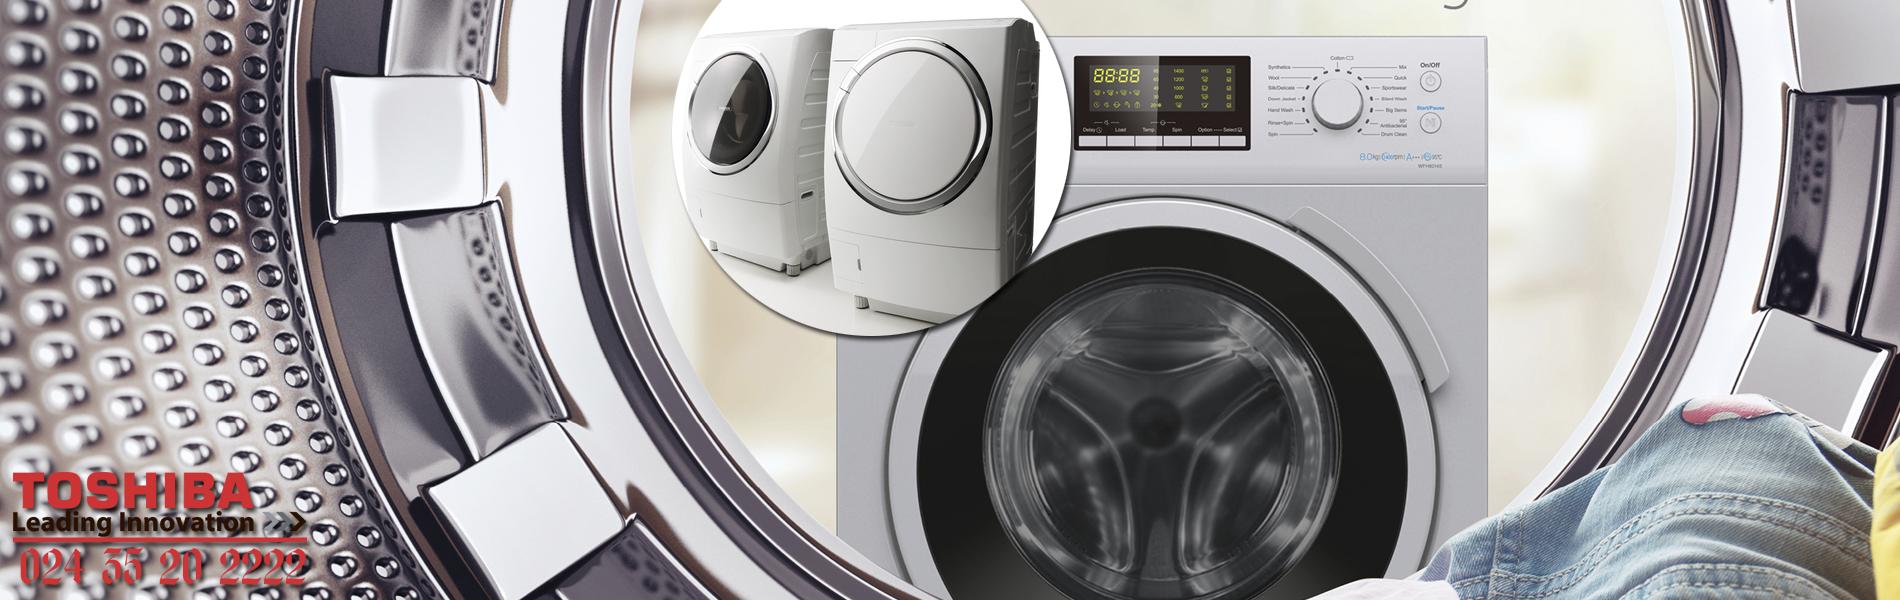 Sửa Máy Giặt Toshiba